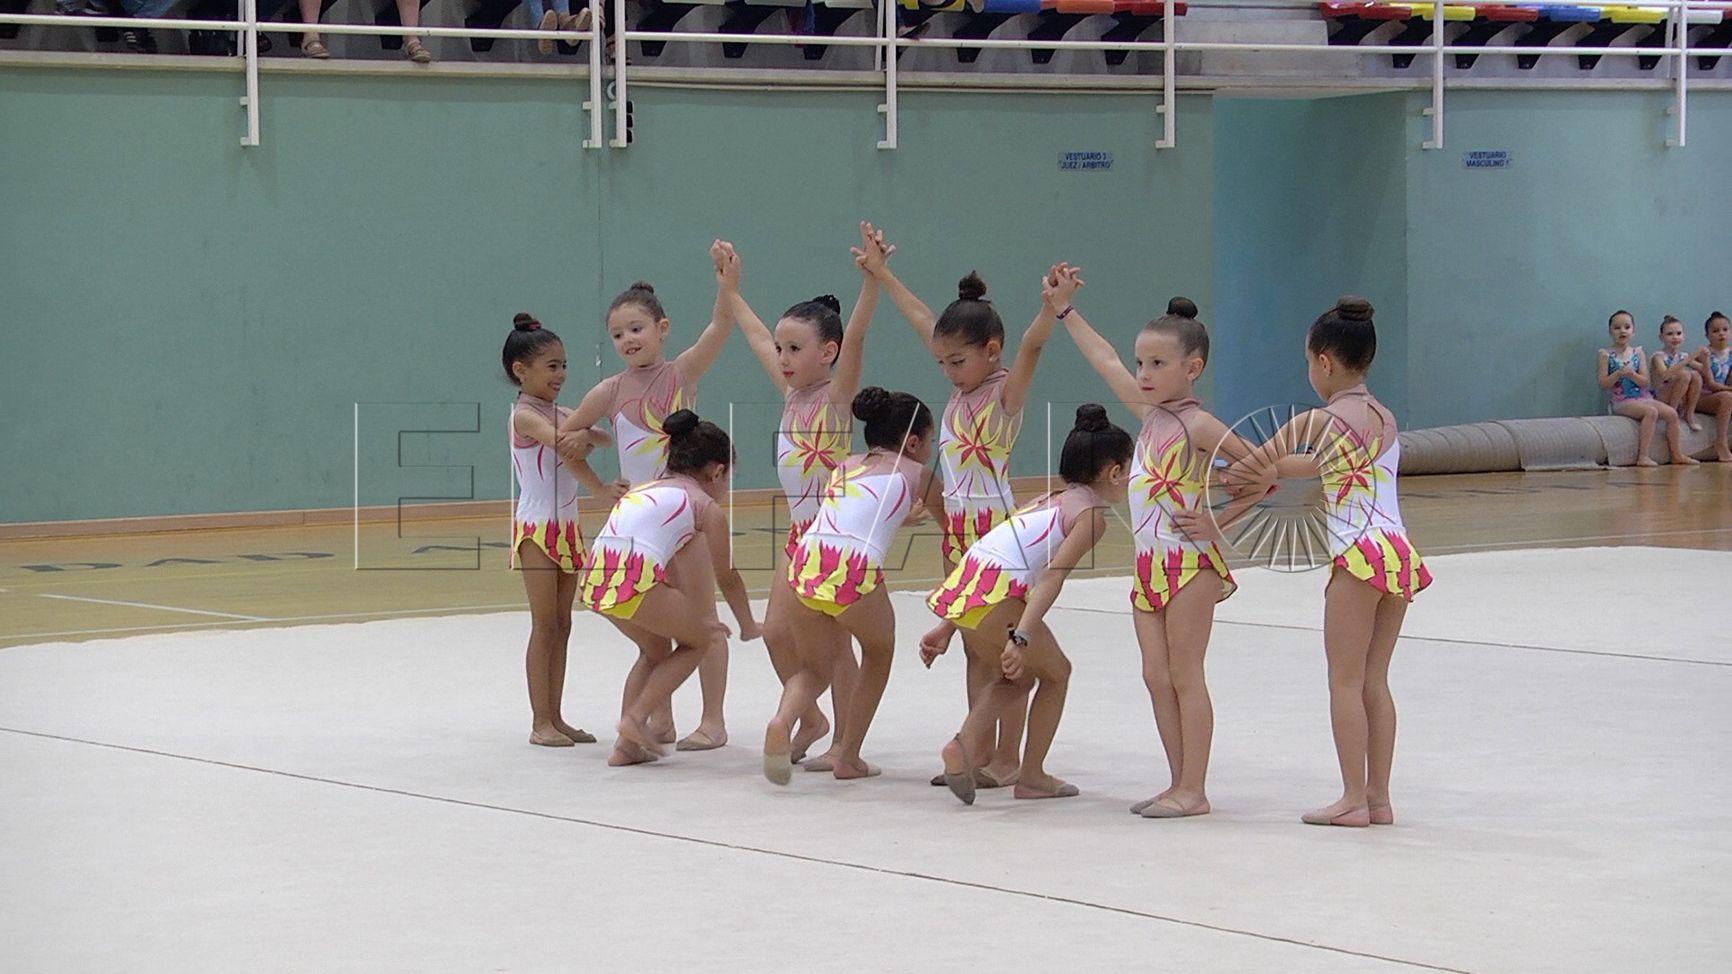 gimnasia-ritmica-6